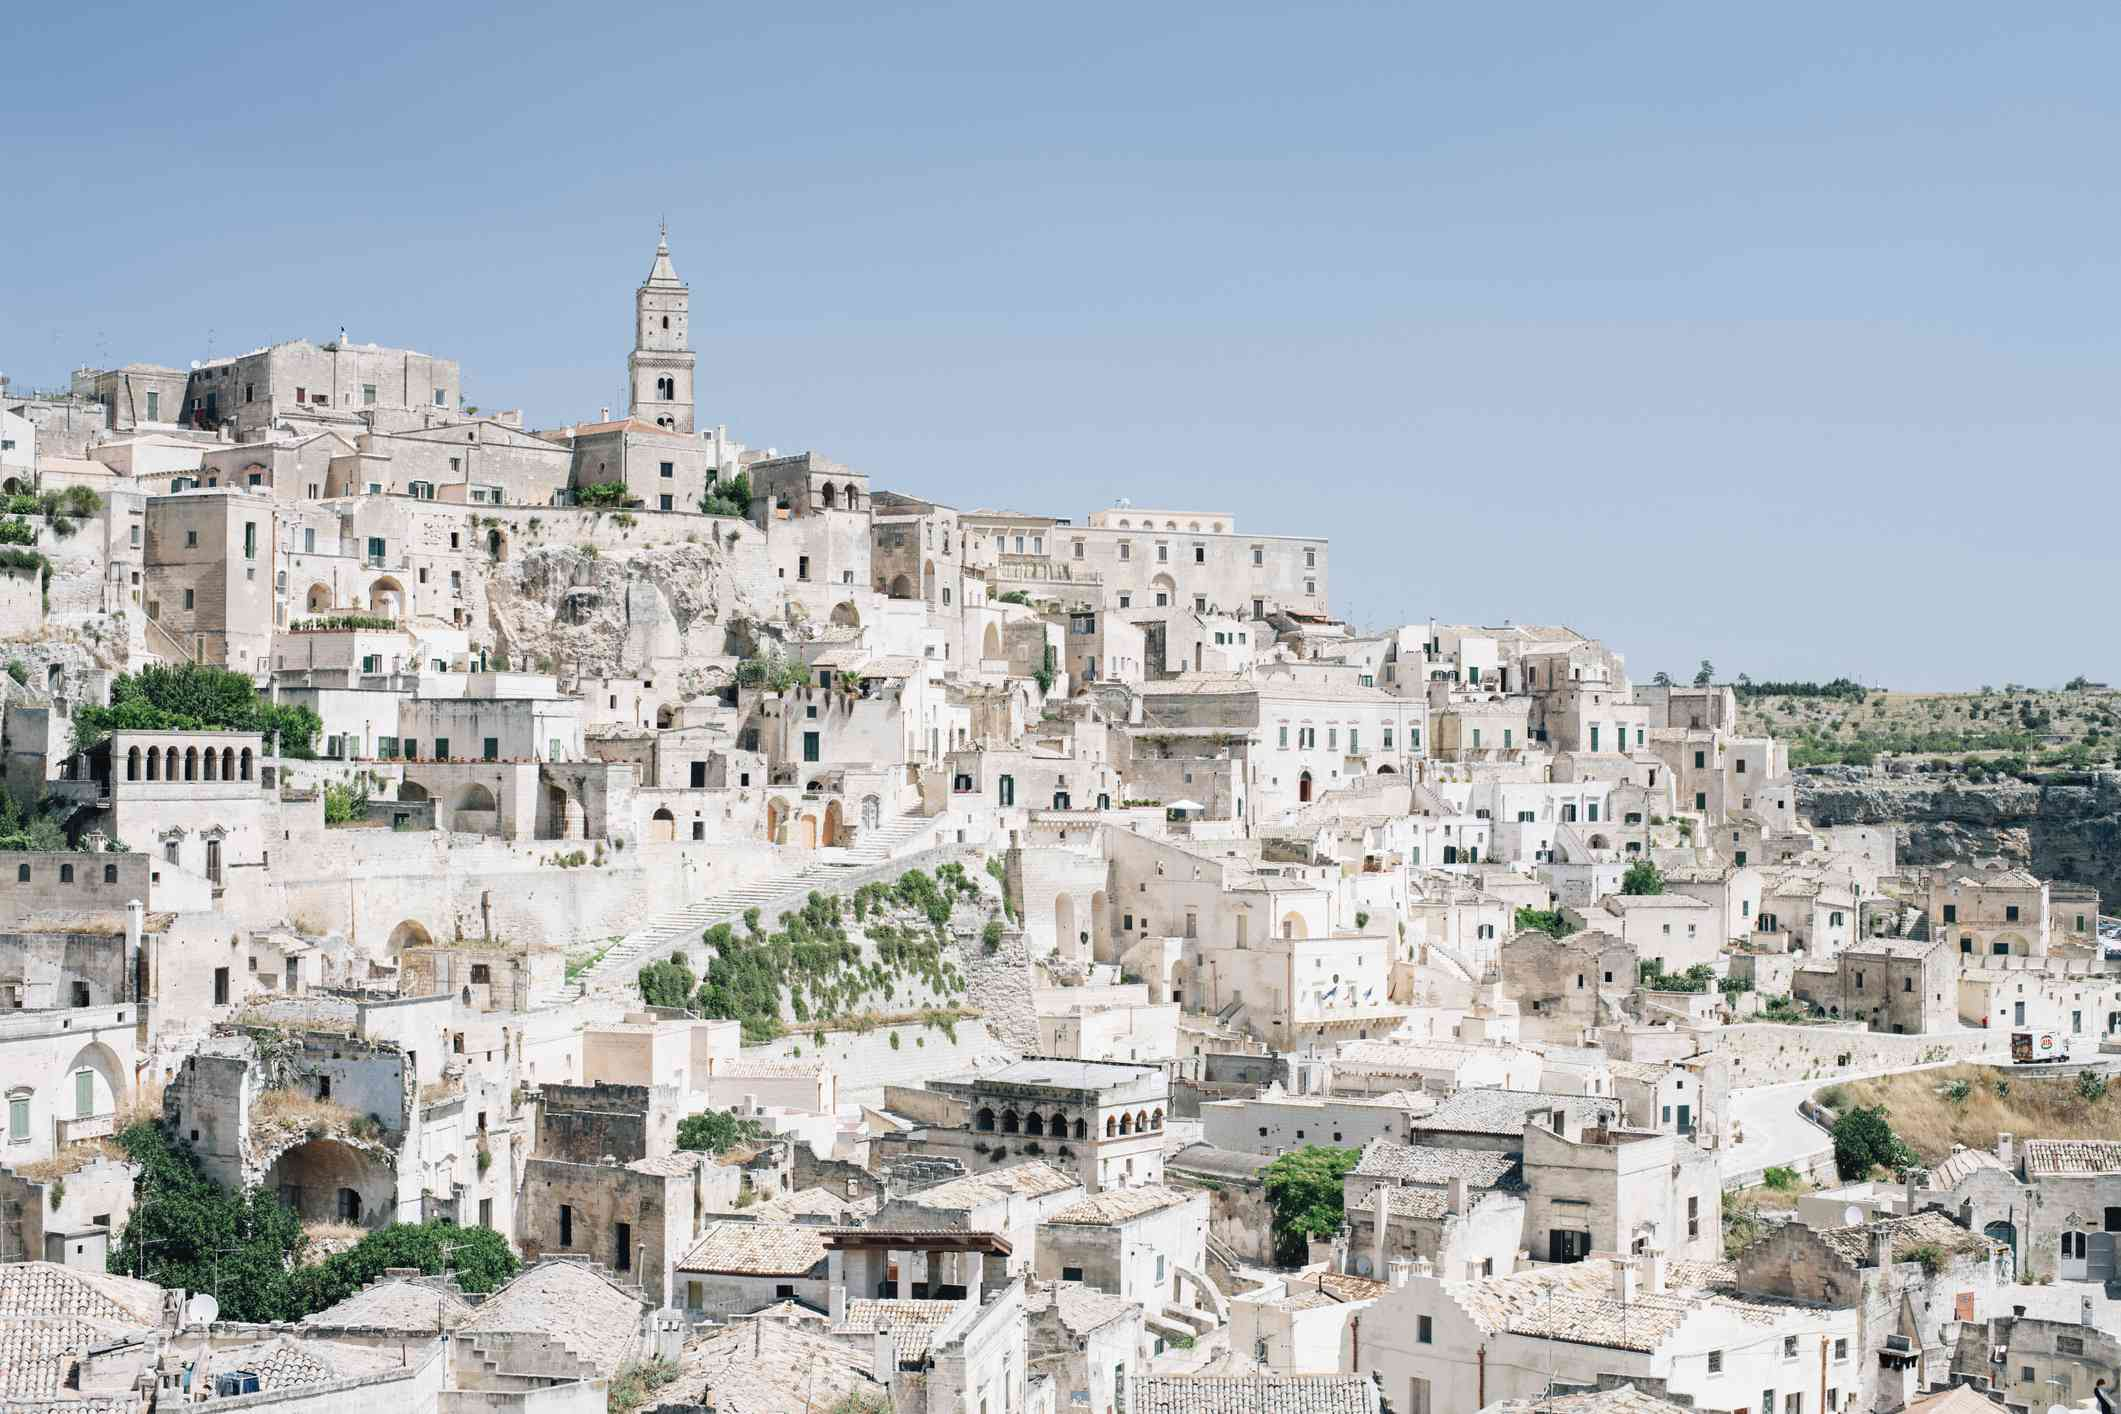 City of Matera on a hillside